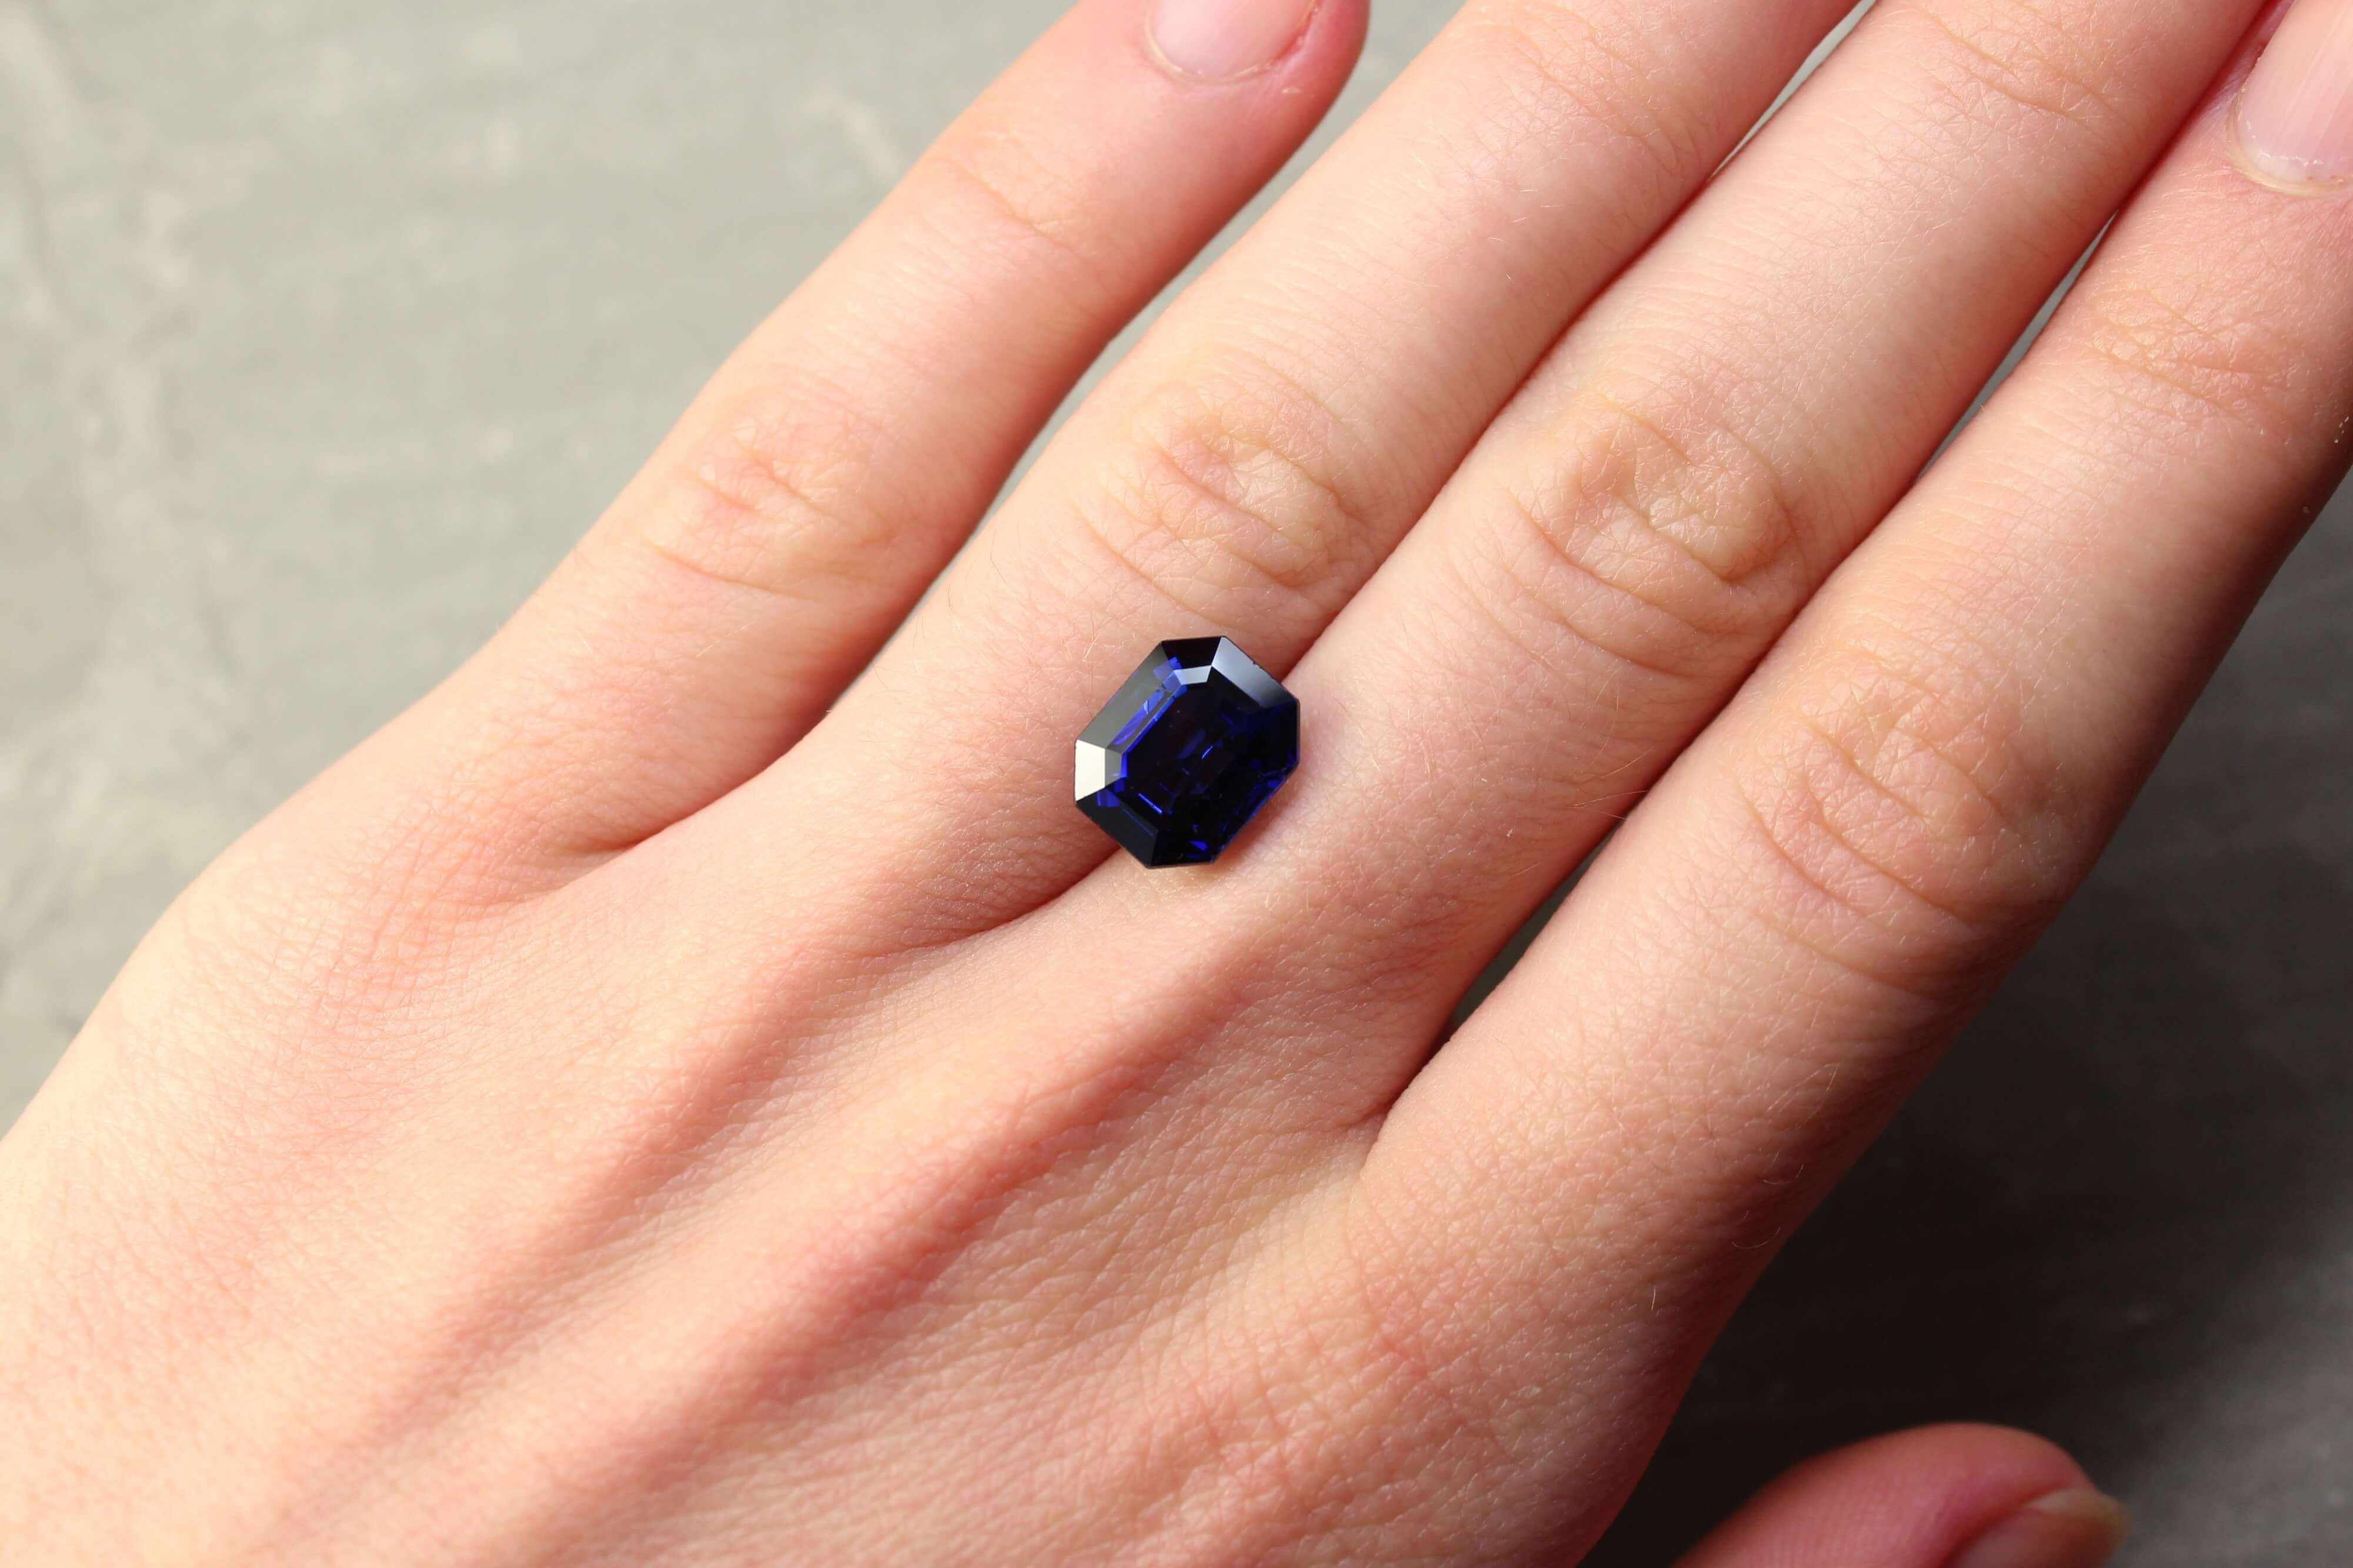 5.11 ct blue octagon sapphire